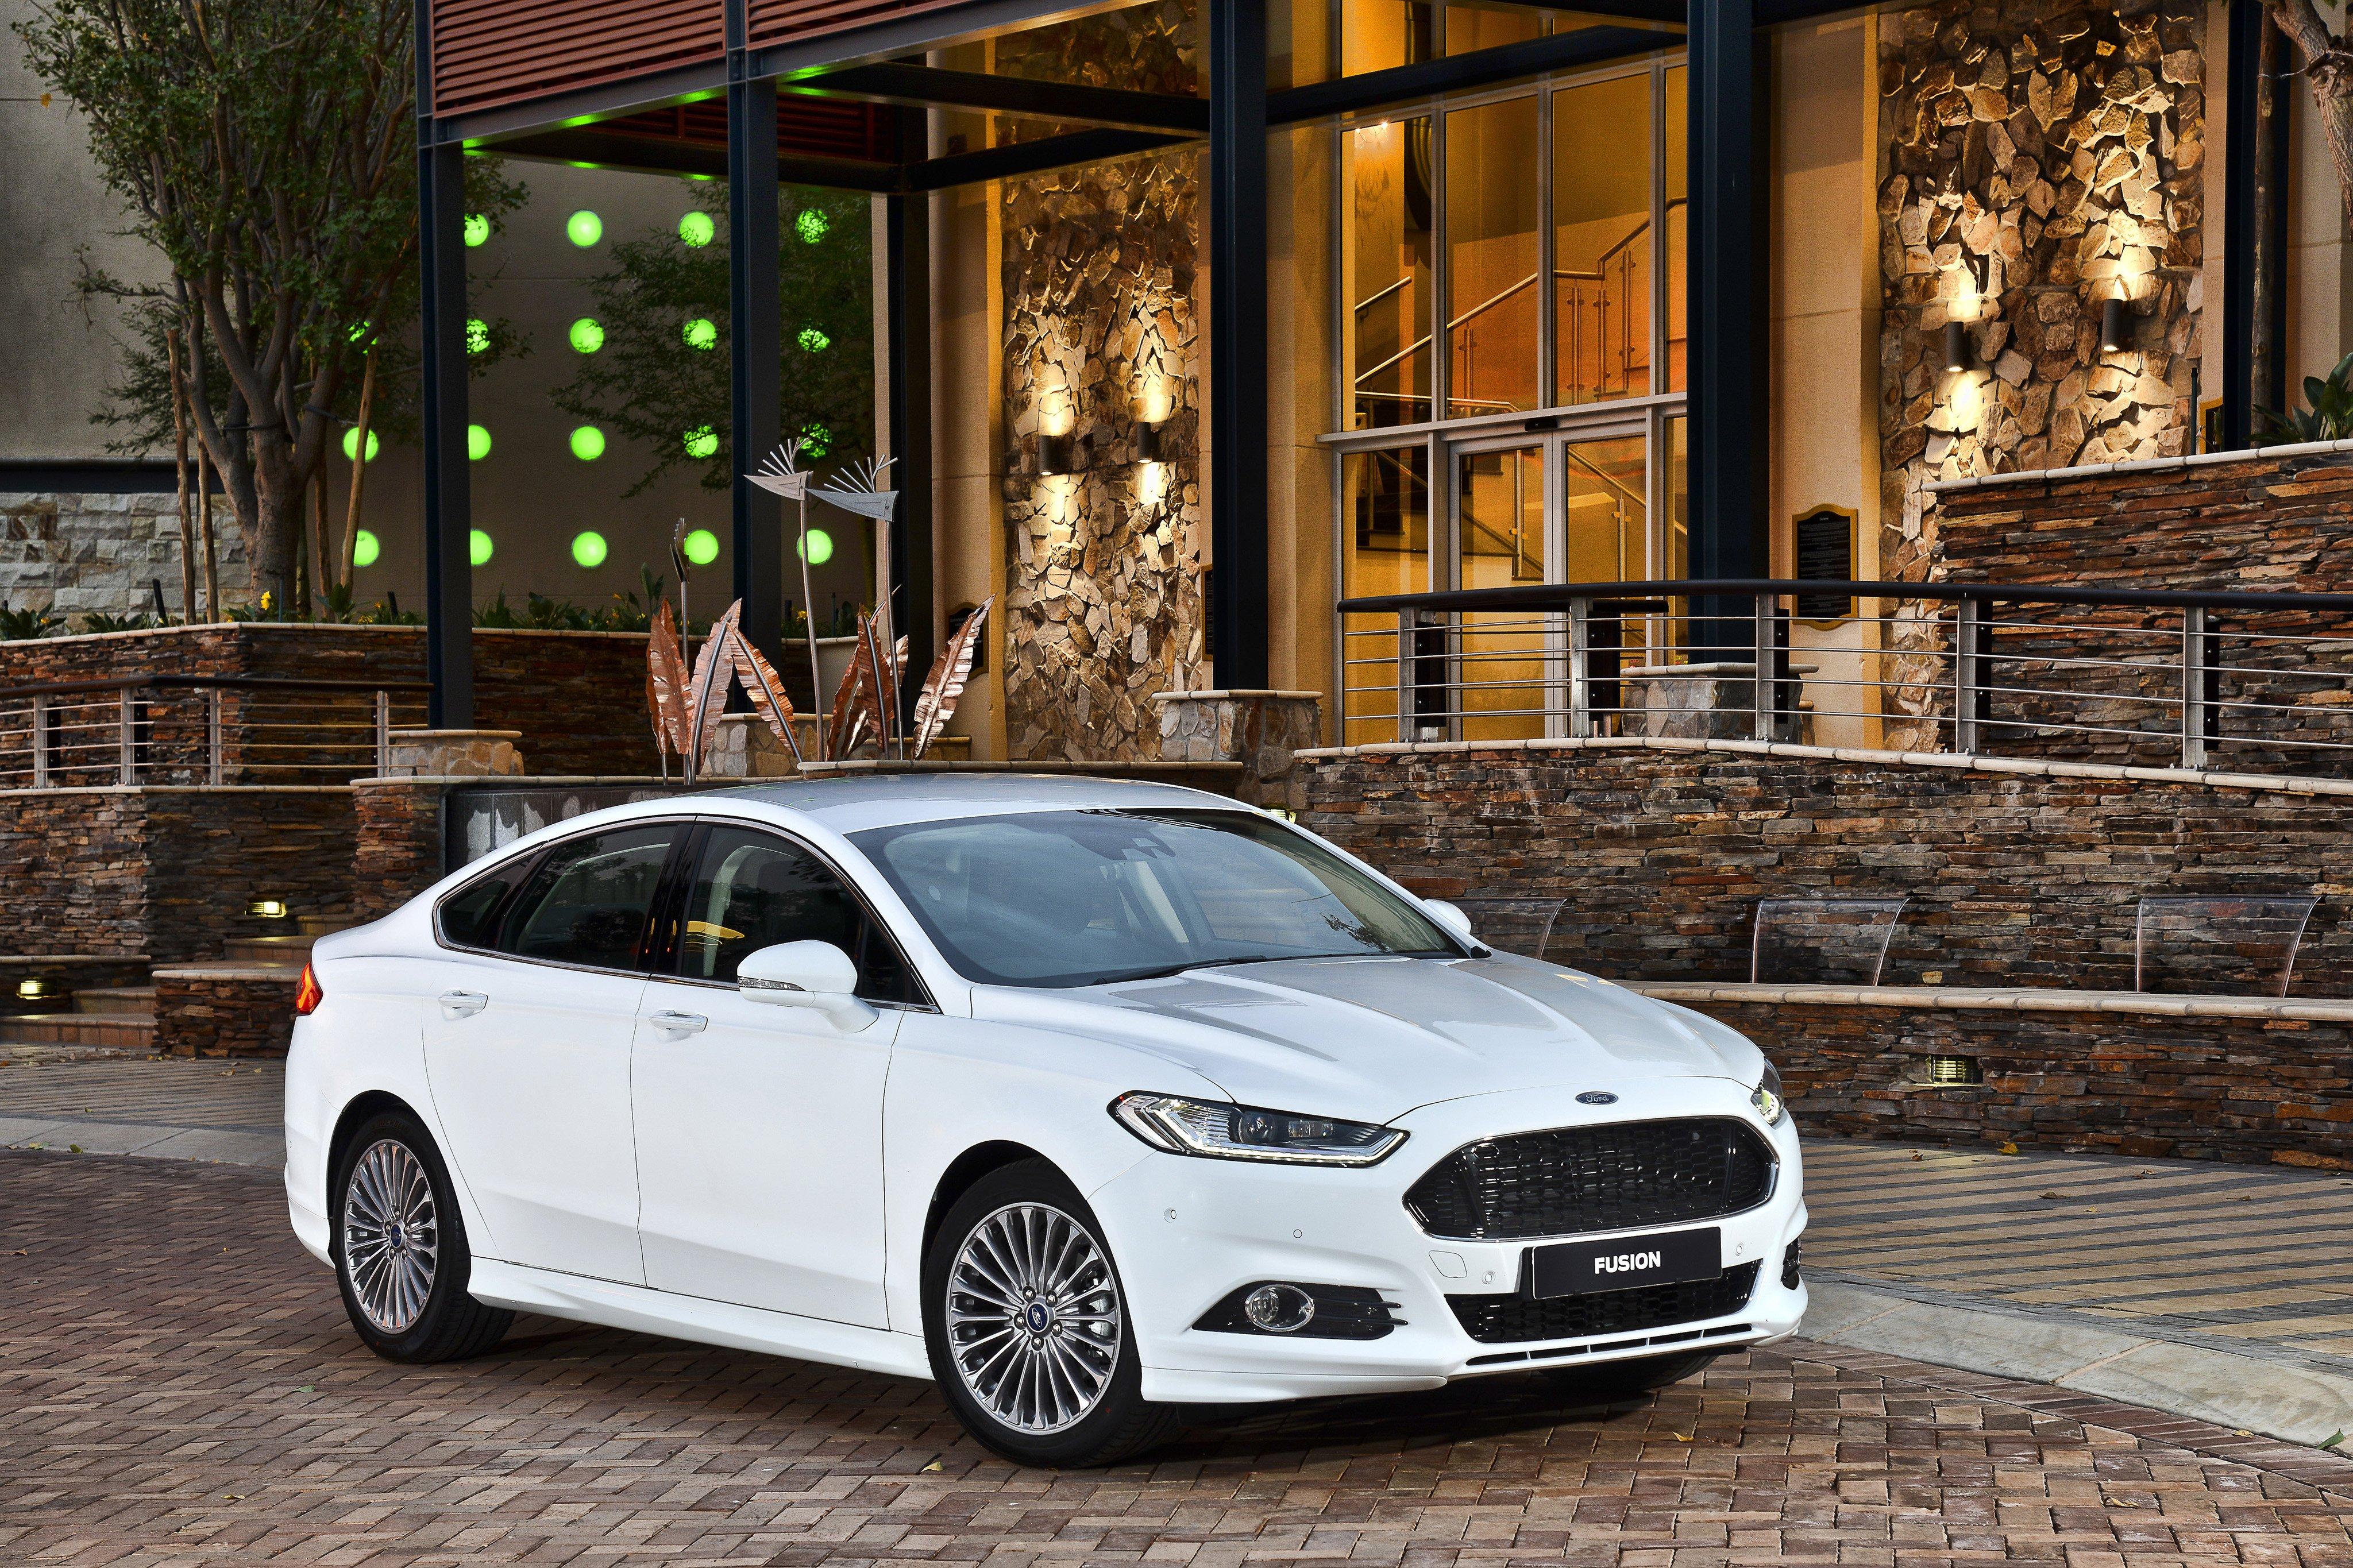 ksa news ford drive arabia body kit saudi exclusive gets fusion uae